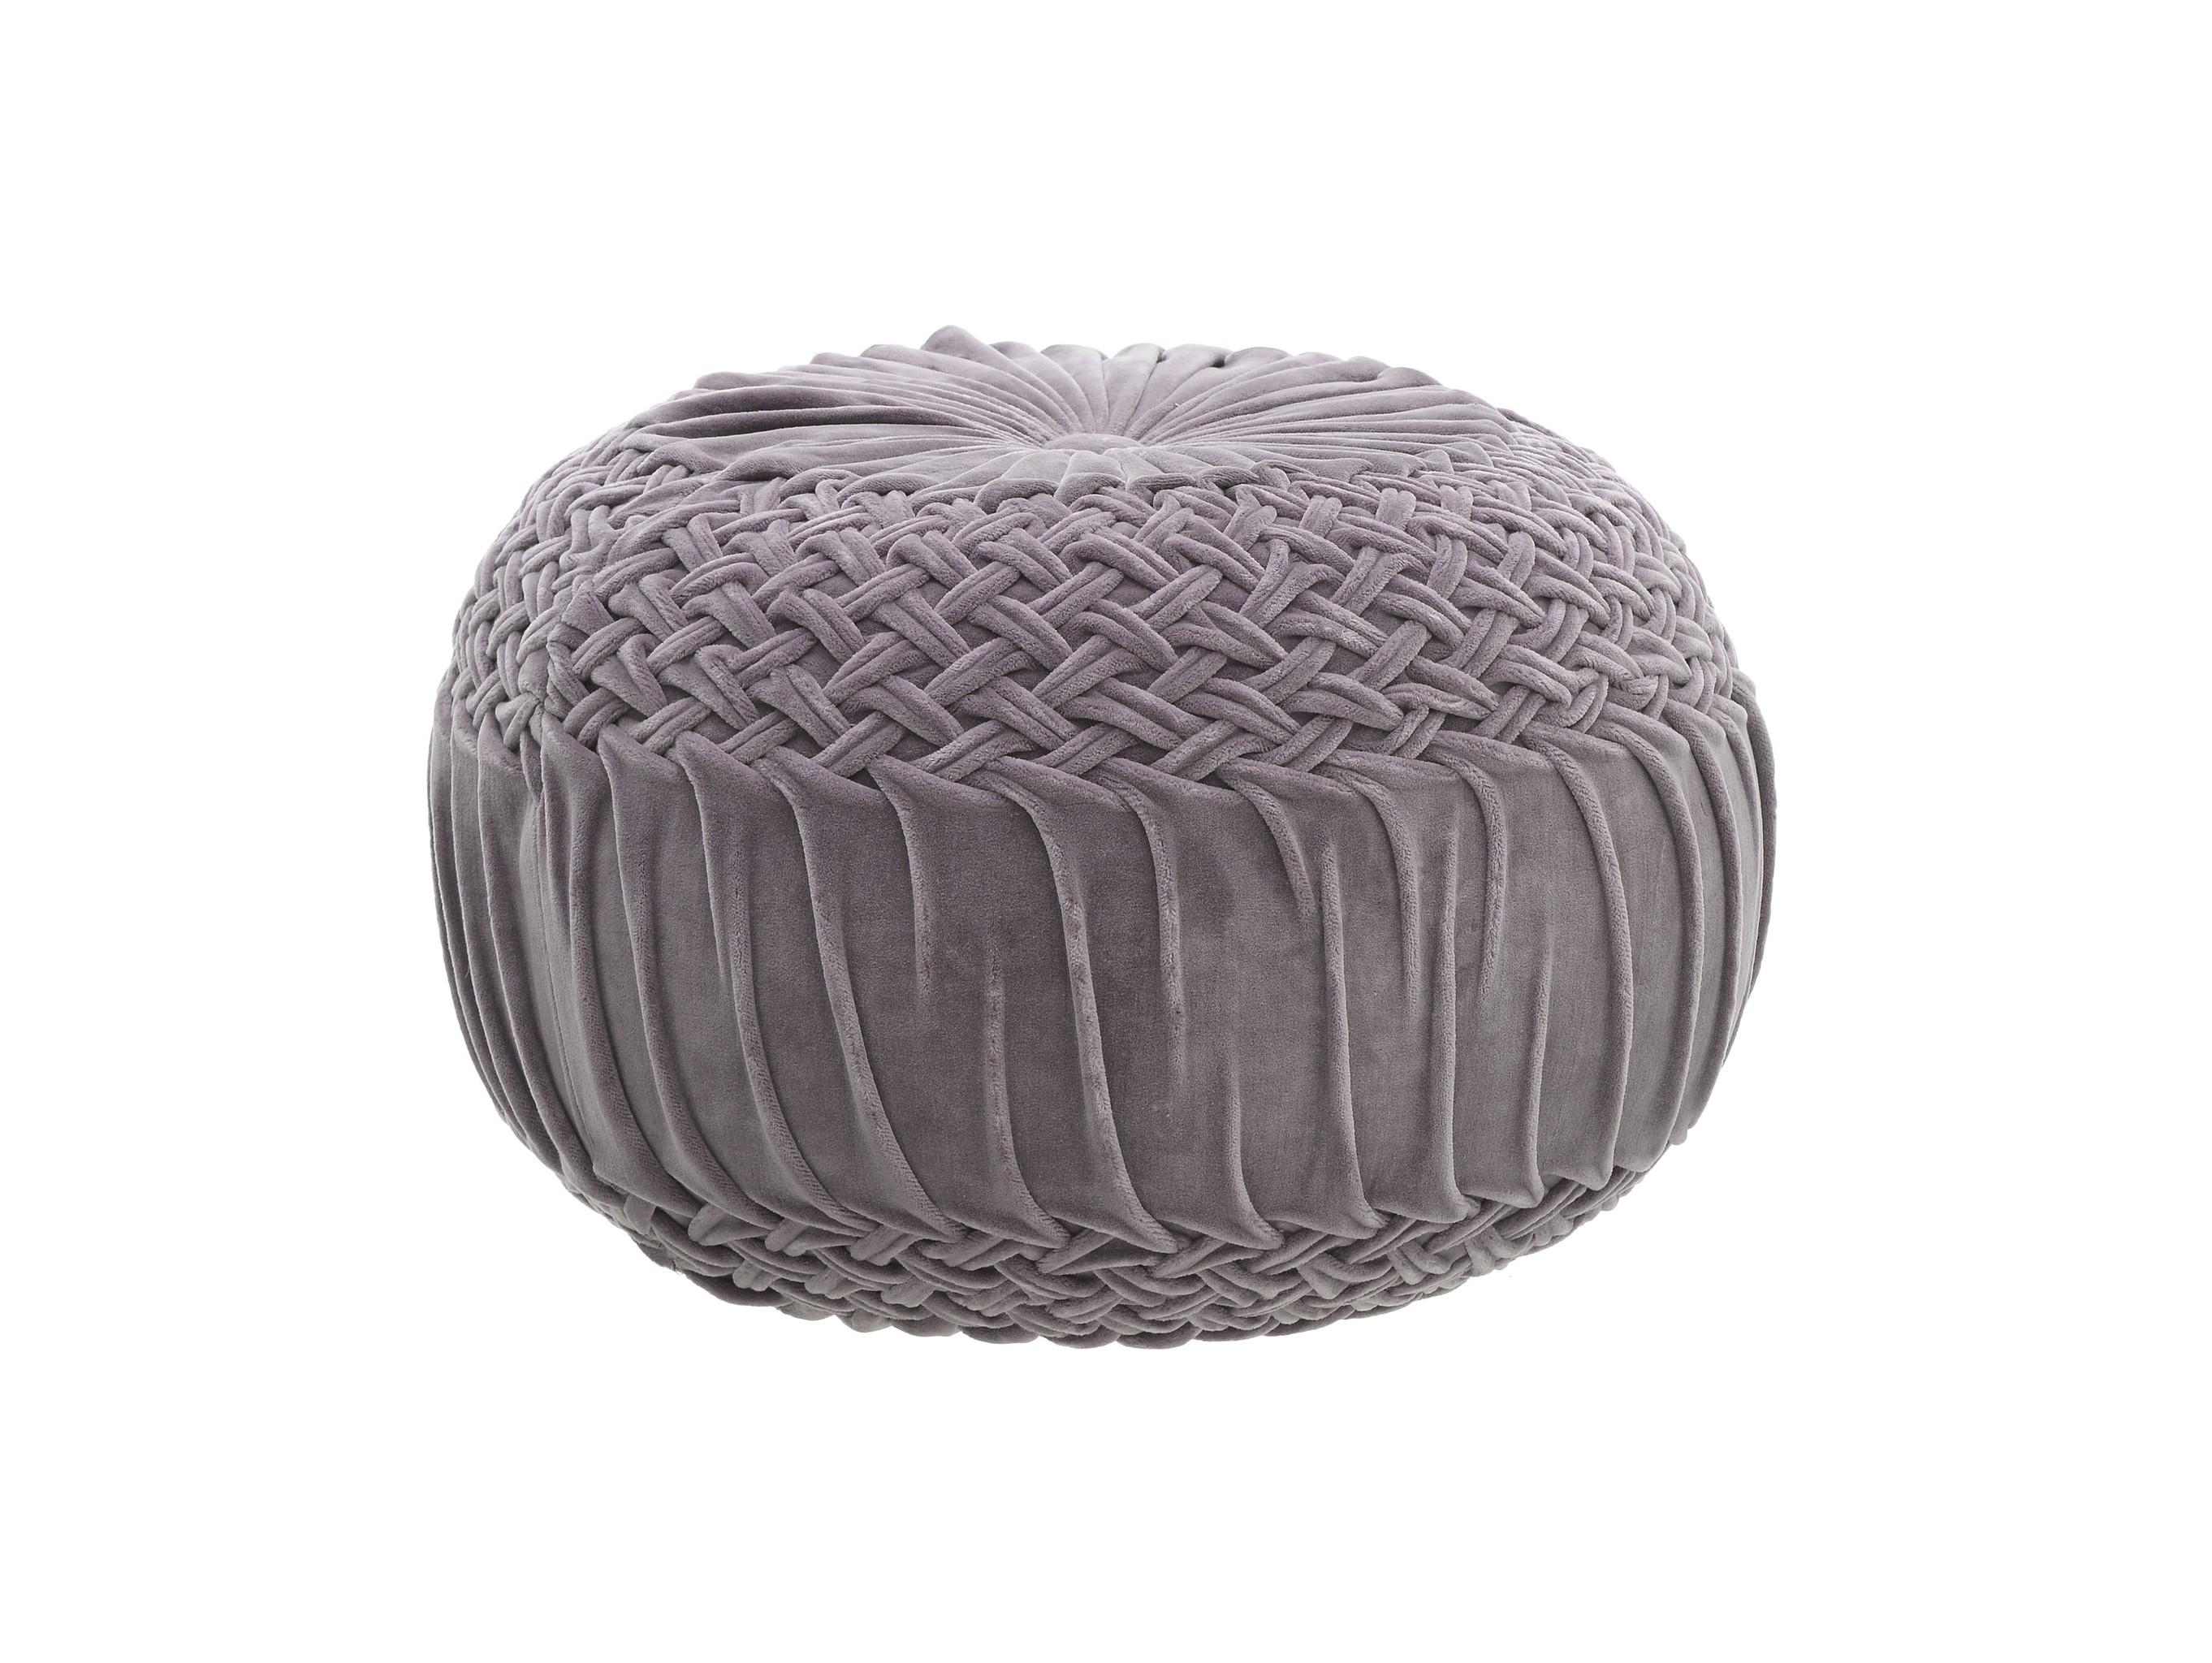 Пуф JehannetteФорменные пуфы<br><br><br>Material: Текстиль<br>Высота см: 35.0